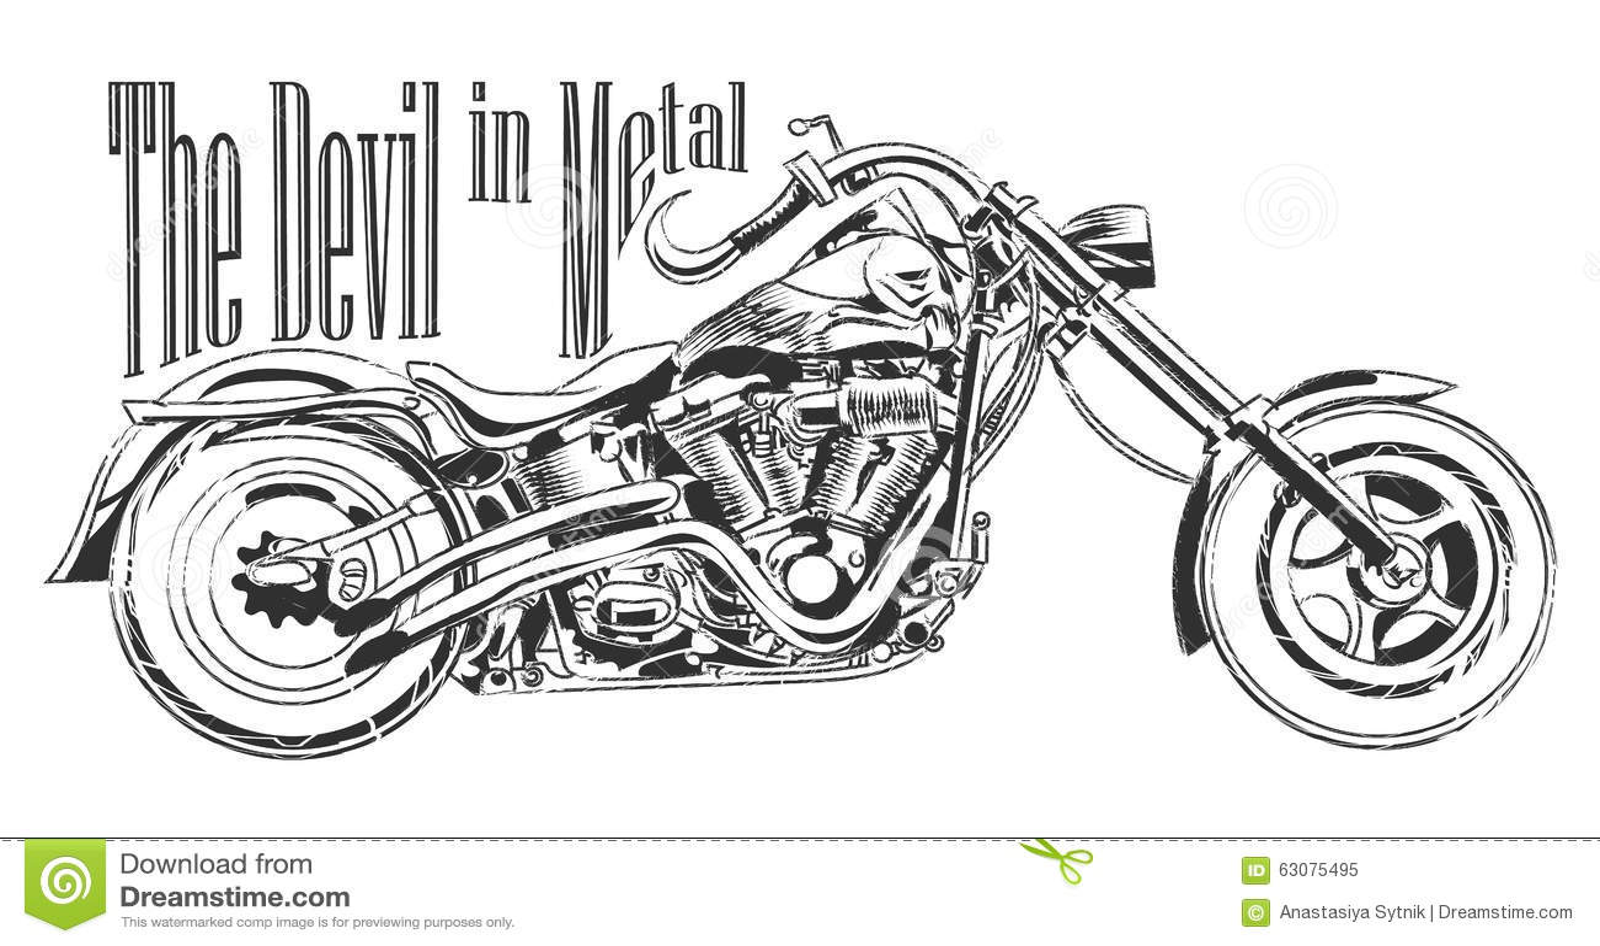 Shirt design los angeles - Los Angeles Motorbike Illustration Tee Shirt Graphic Design